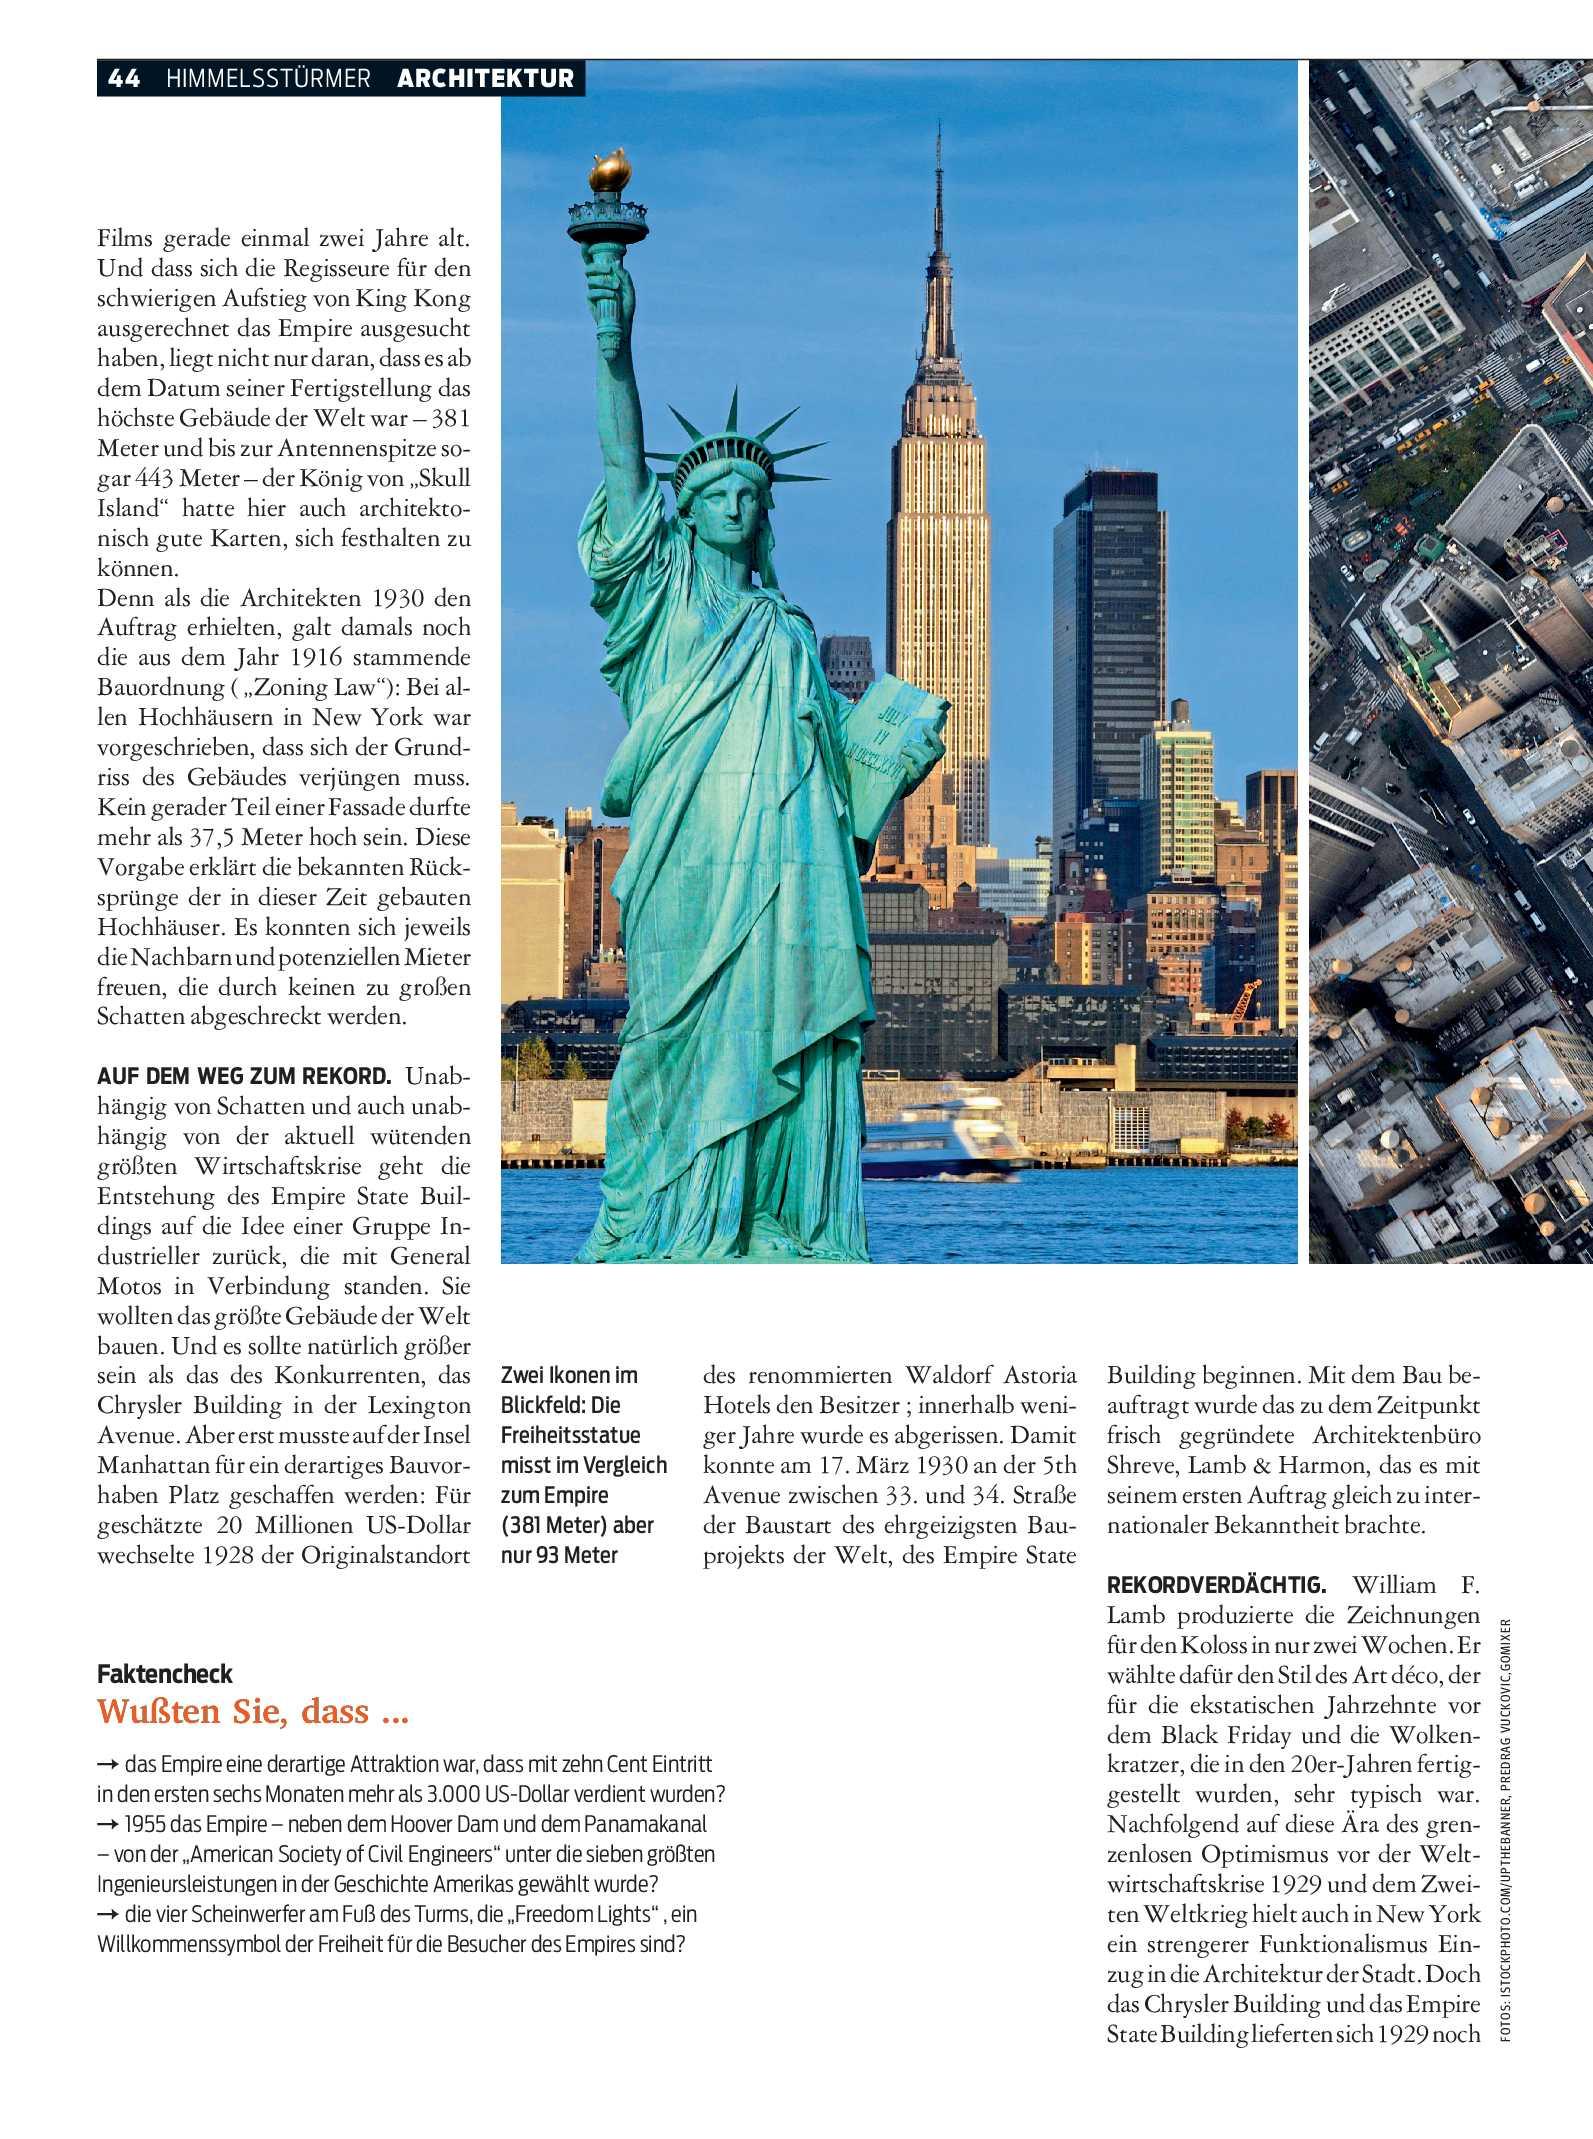 public/epaper/imported/20200930/kurier/magazin/magazin_20200930_044.jpg